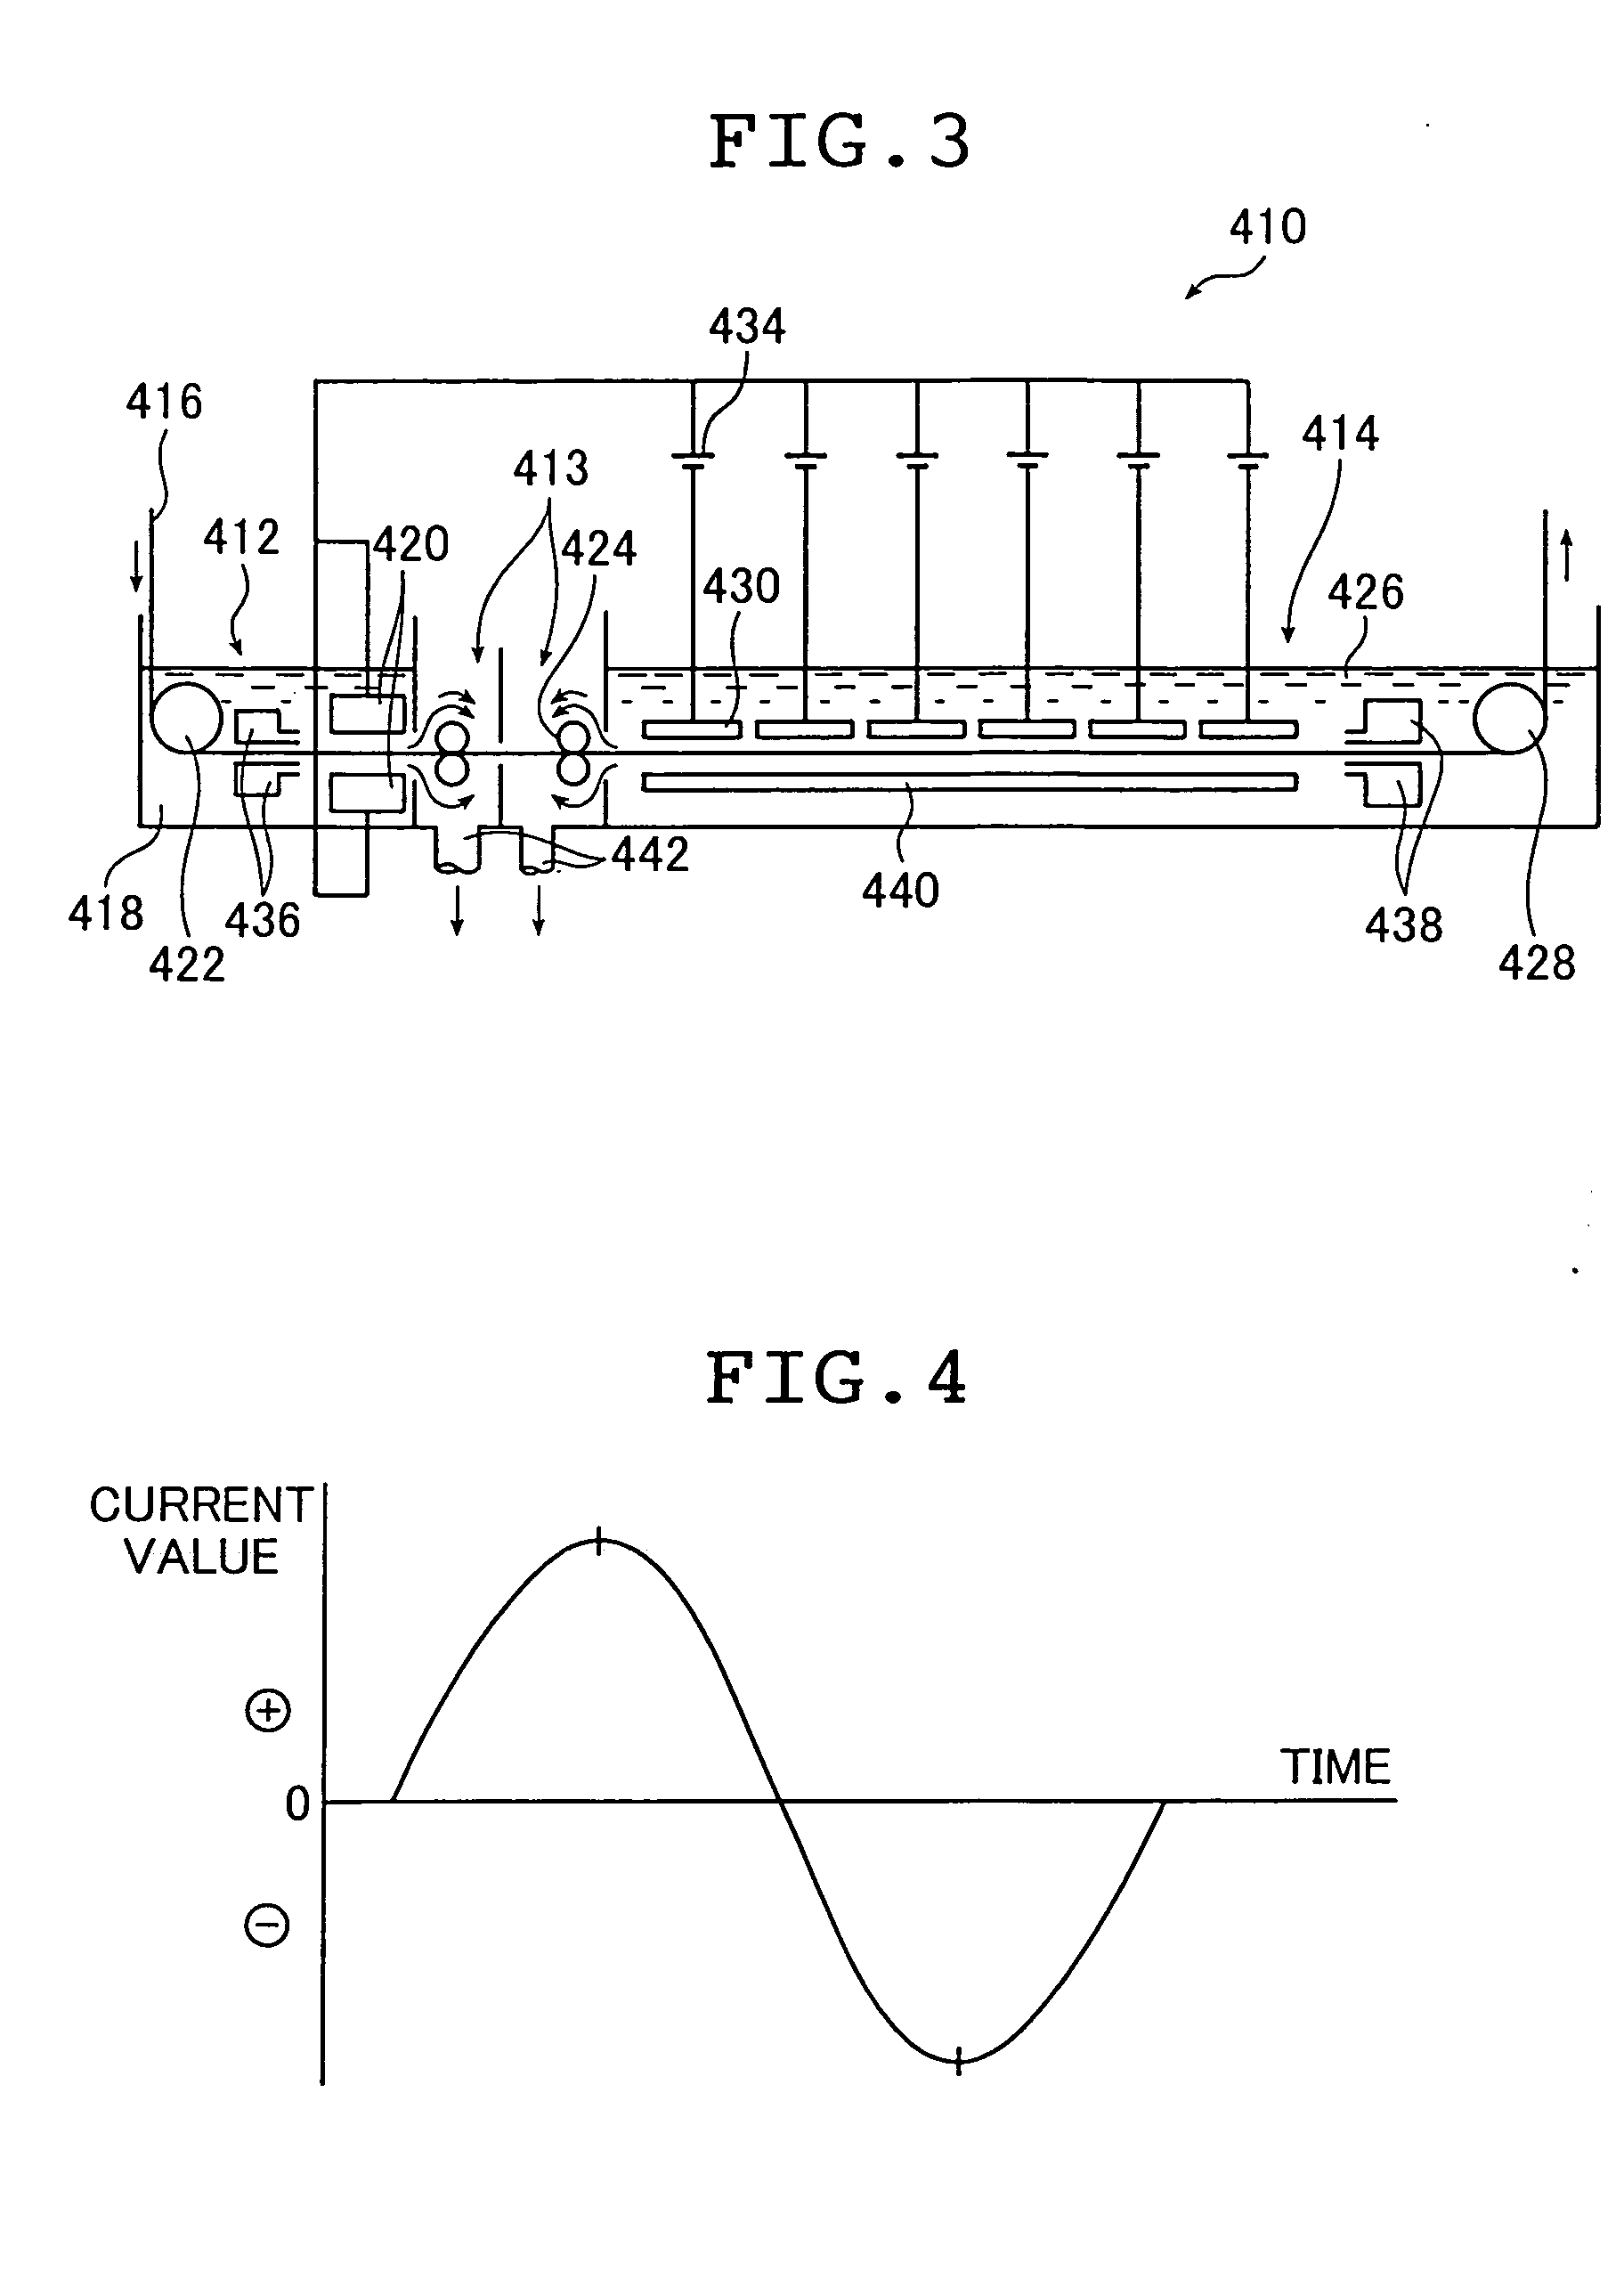 4B39 Wiring Diagram 700 434 Gas Valve | Wiring LibraryWiring Library